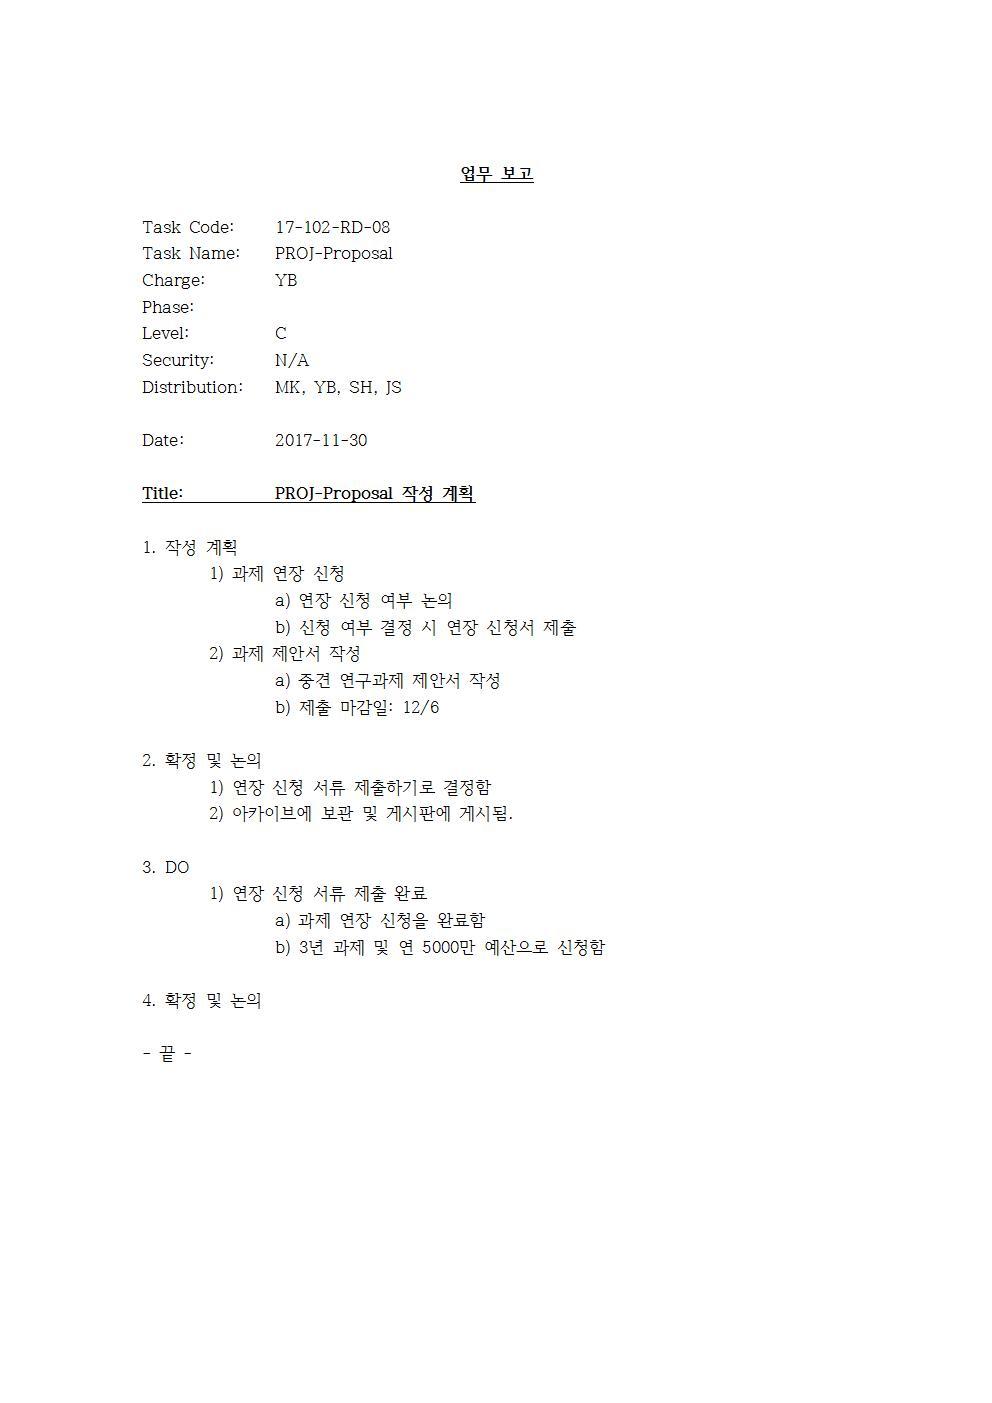 D-[17-102-RD-08]-[PROJ-Proposal]-[YB]-[2017-11-30]001.jpg